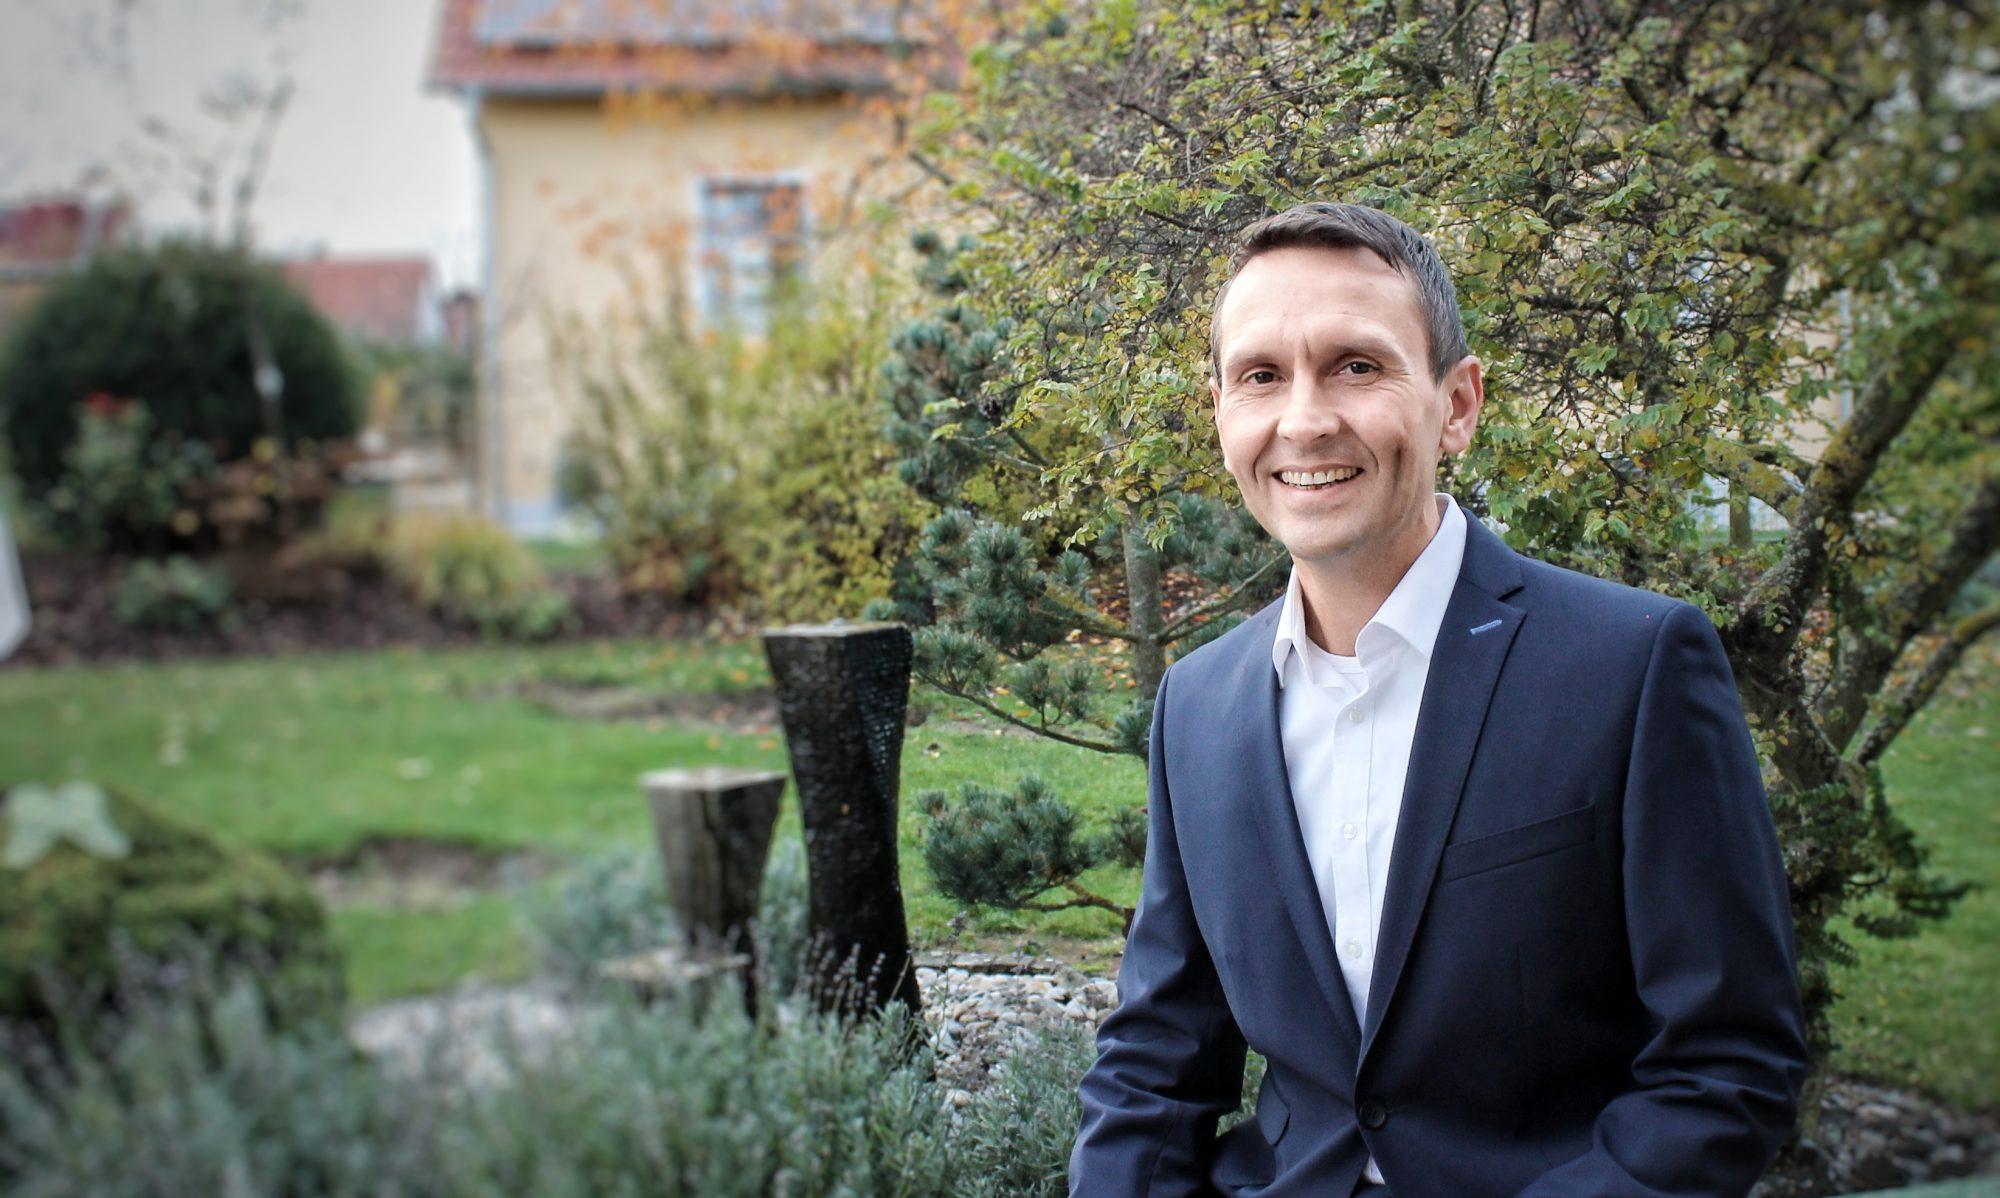 Thomas Blaumeier Bürgermeisterkandidat